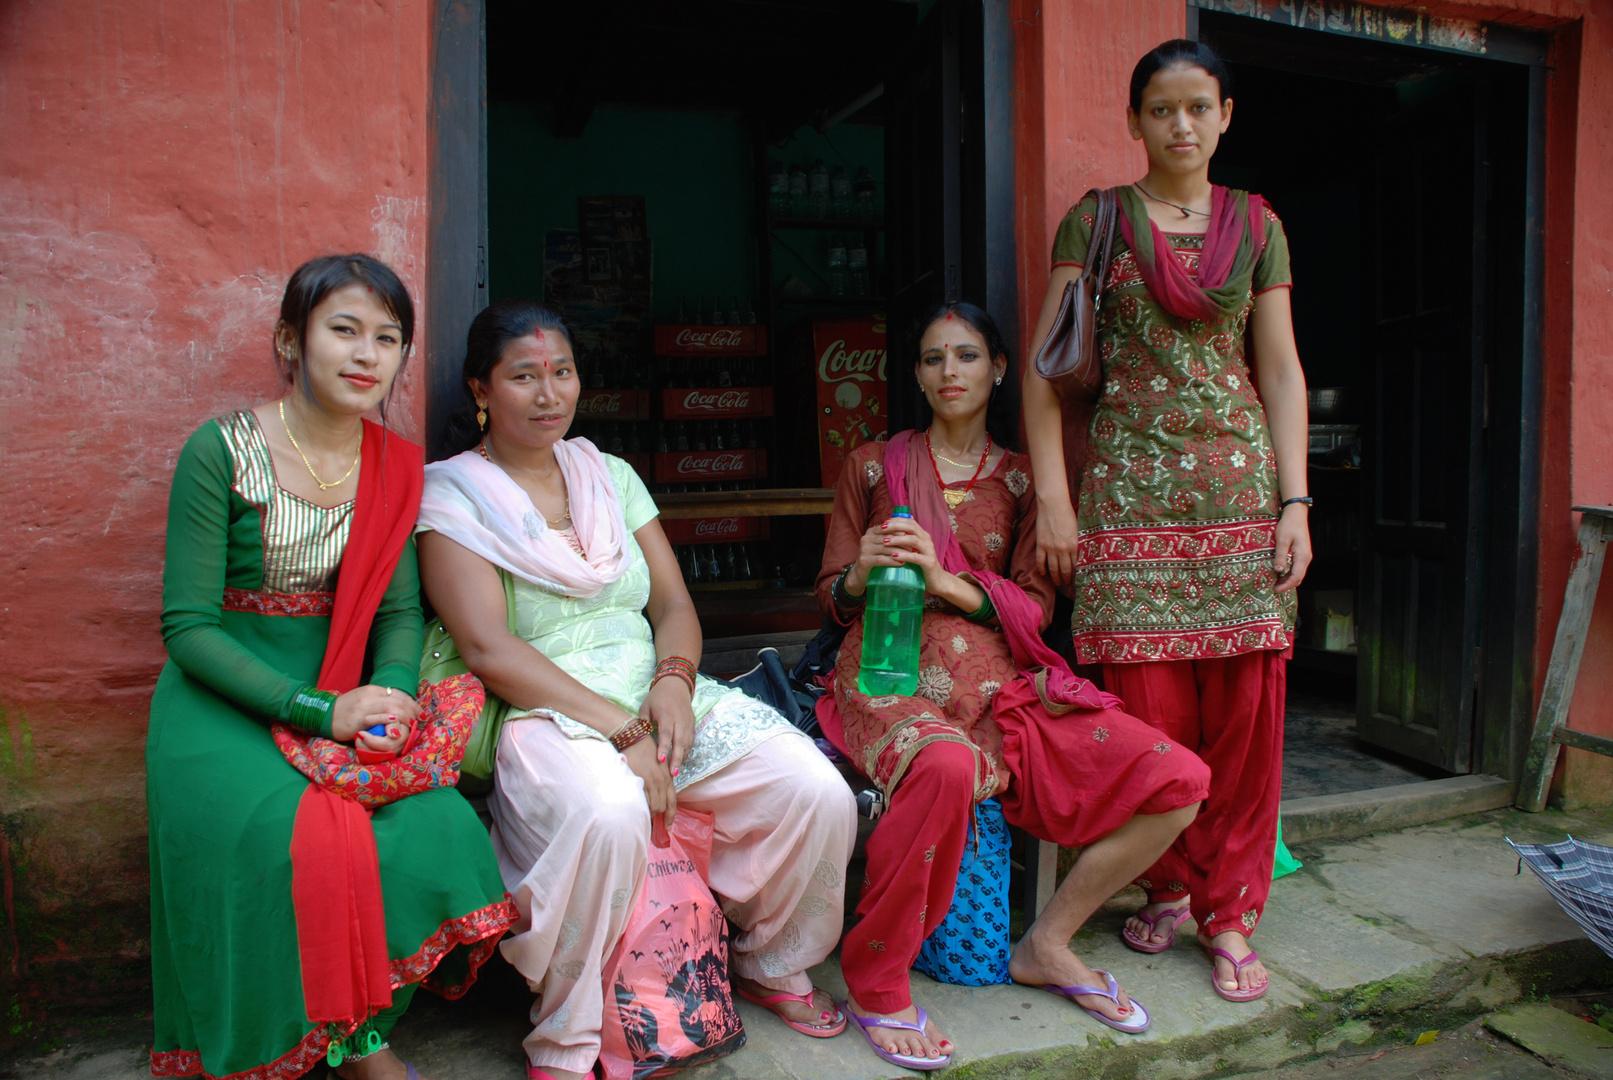 Nepali elegance